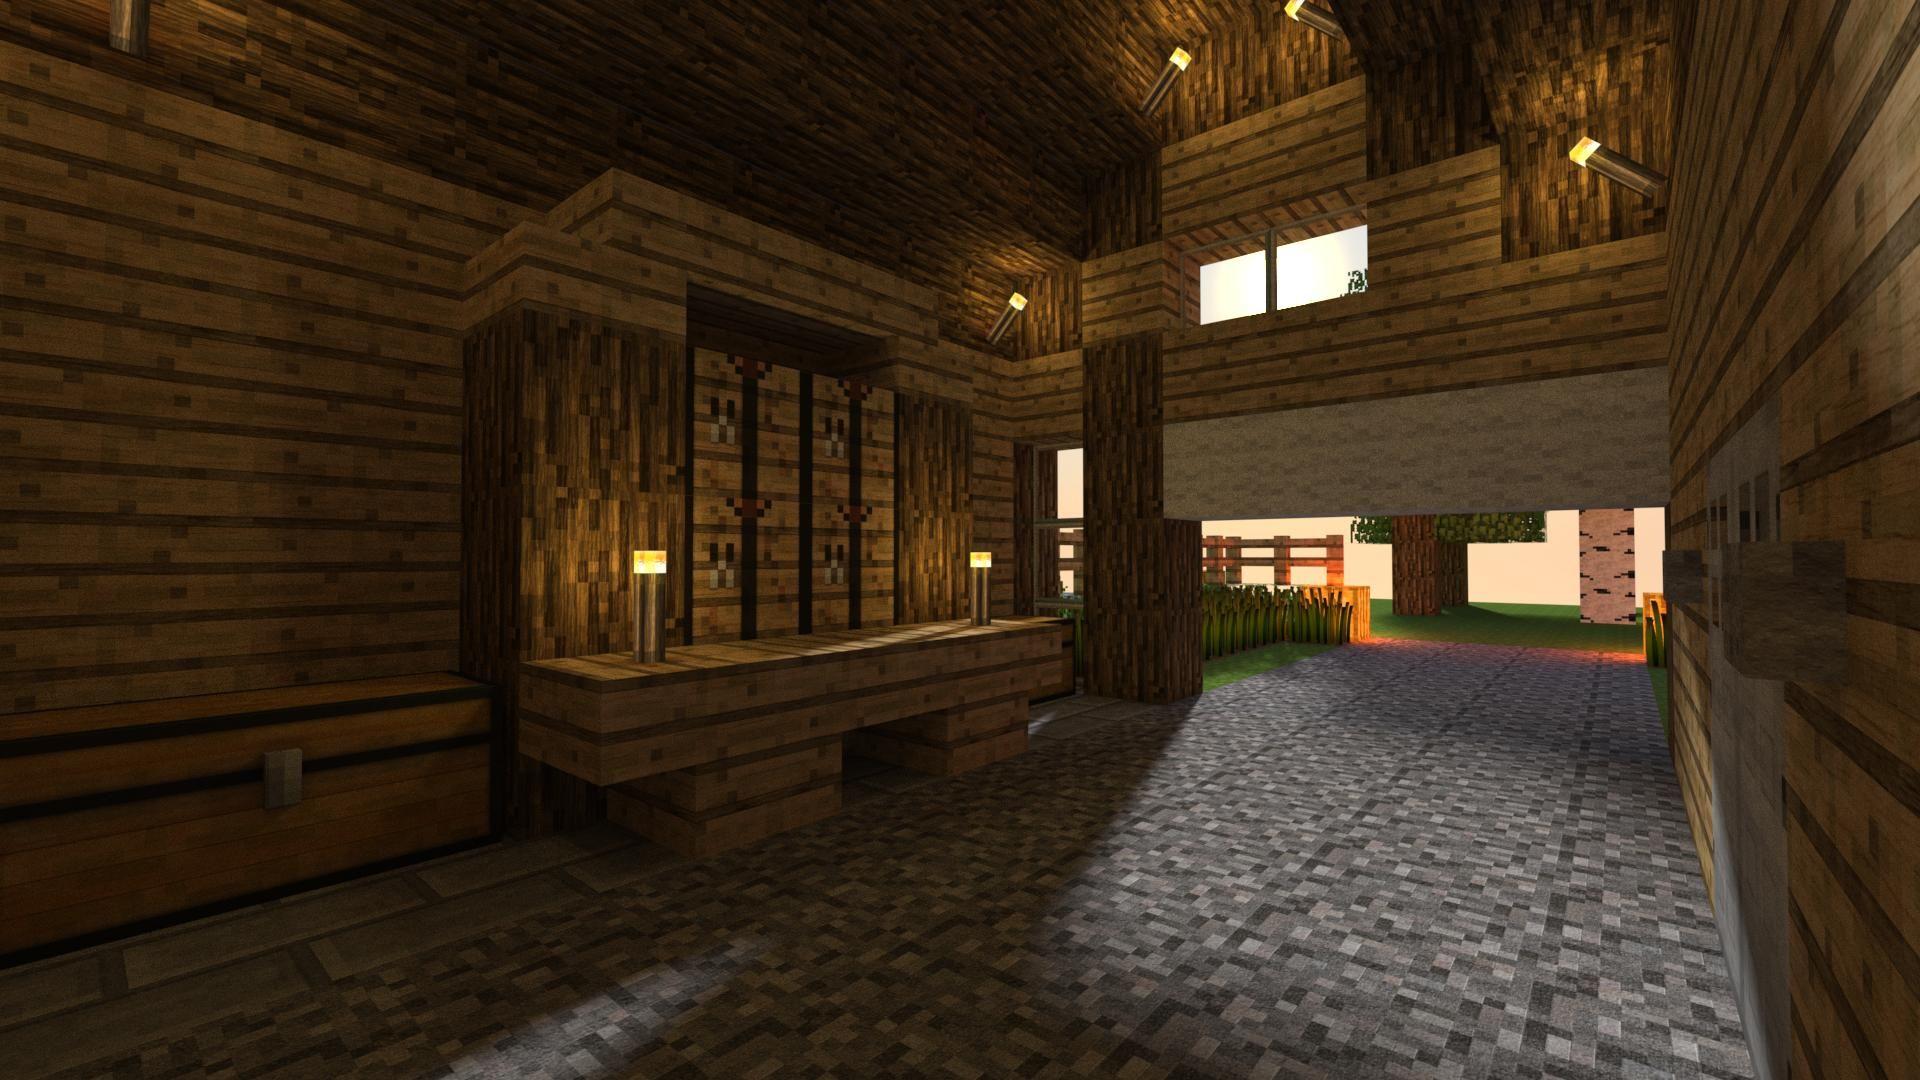 minecraft interior decorating ideas minecraft garage design minecraft interior decorating ideas minecraft garage design